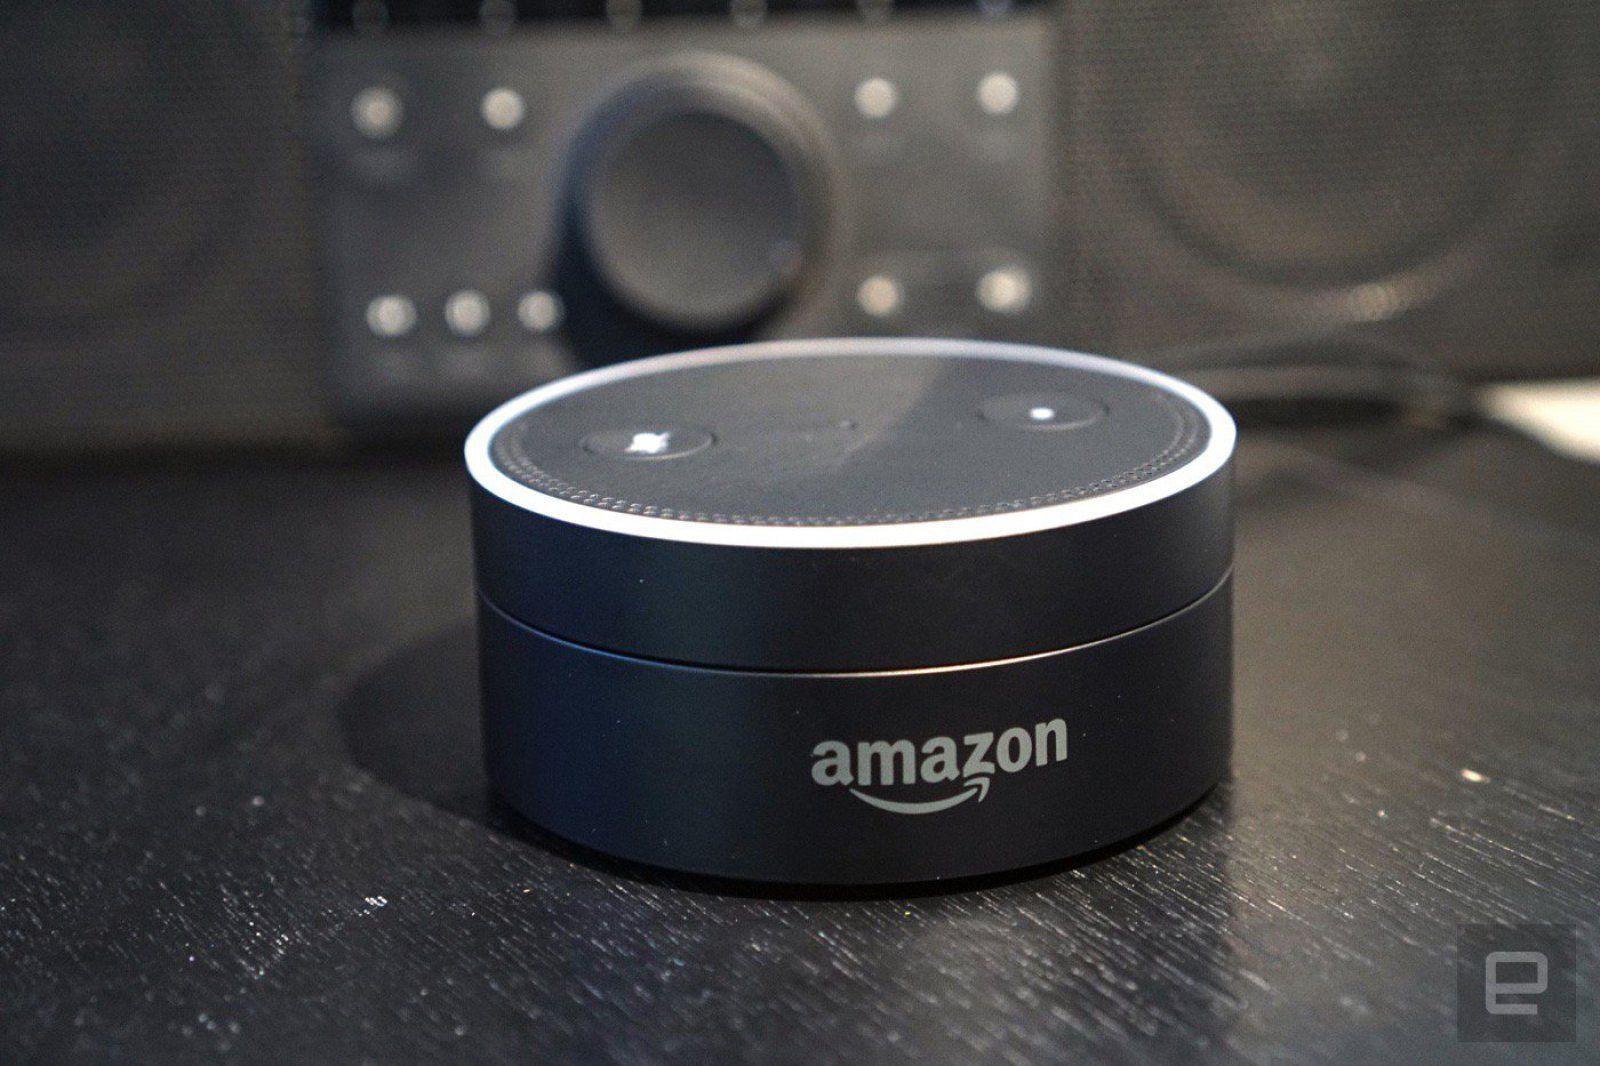 Amazon S New Policy Kills Ad Network That Monetizes Echo Skills Amazon Amazon Alexa Amazon Echo